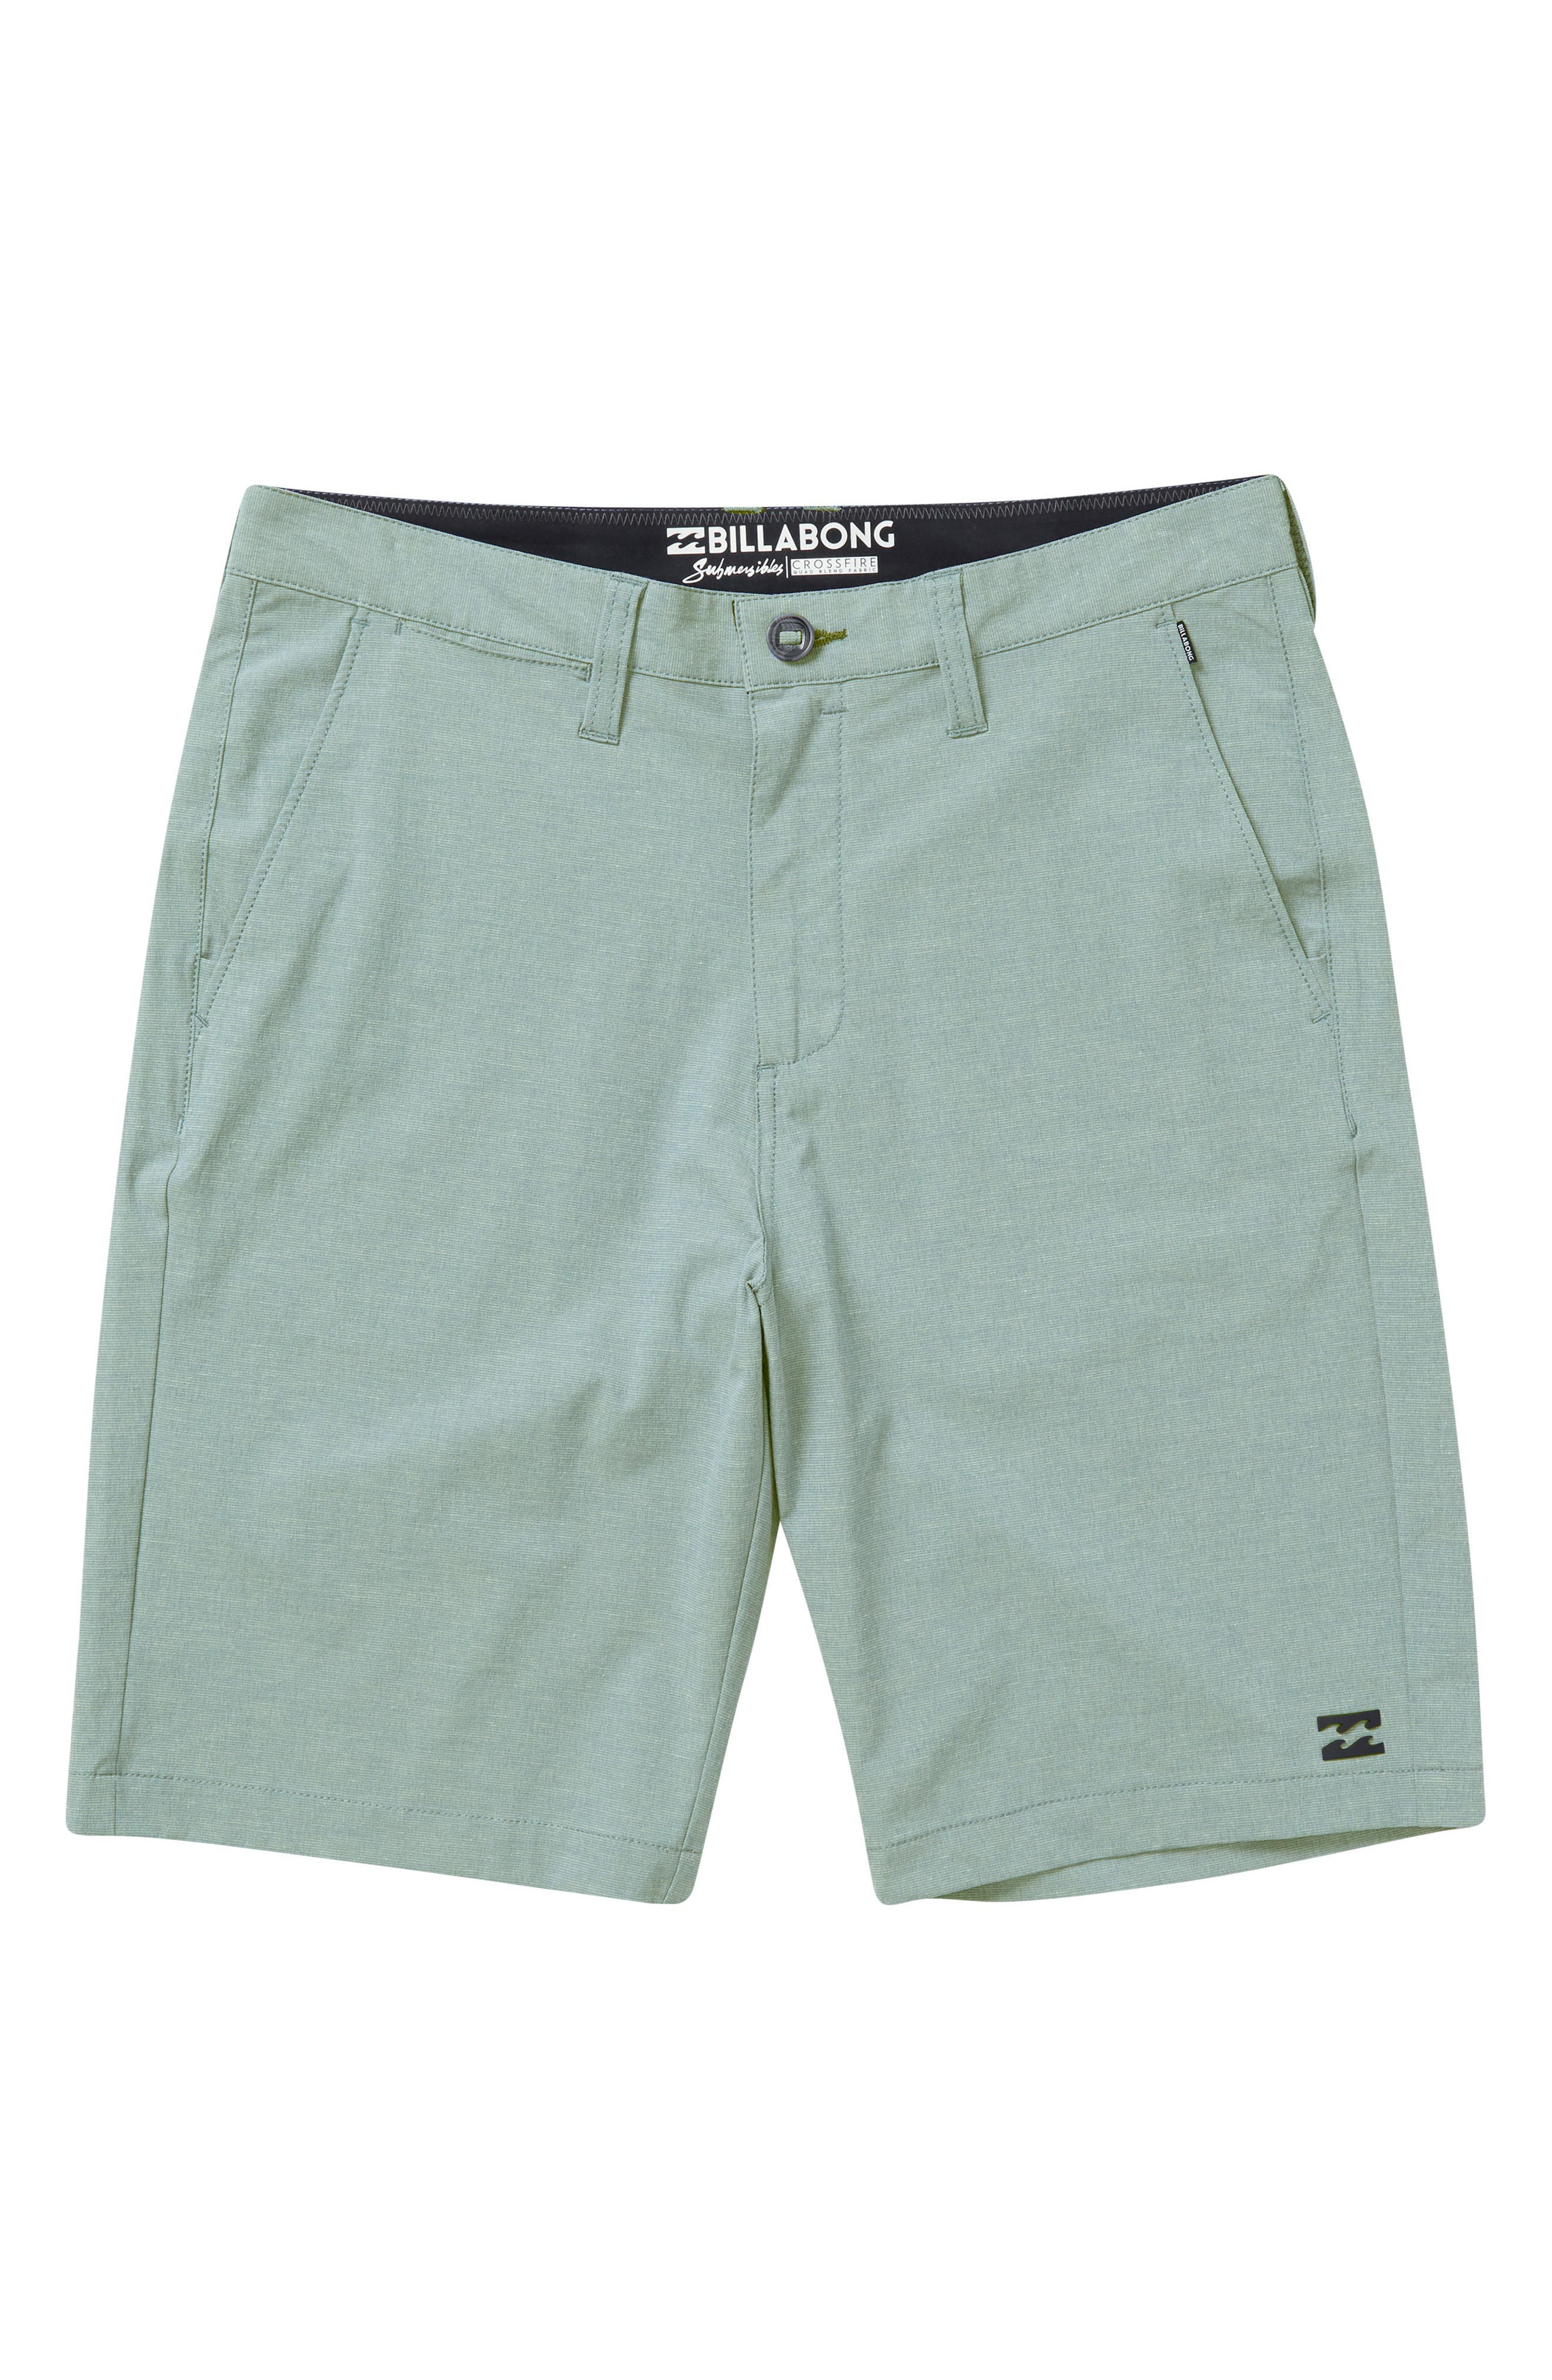 Crossfire X Hybrid Shorts,                         Main,                         color, Dusty Blue